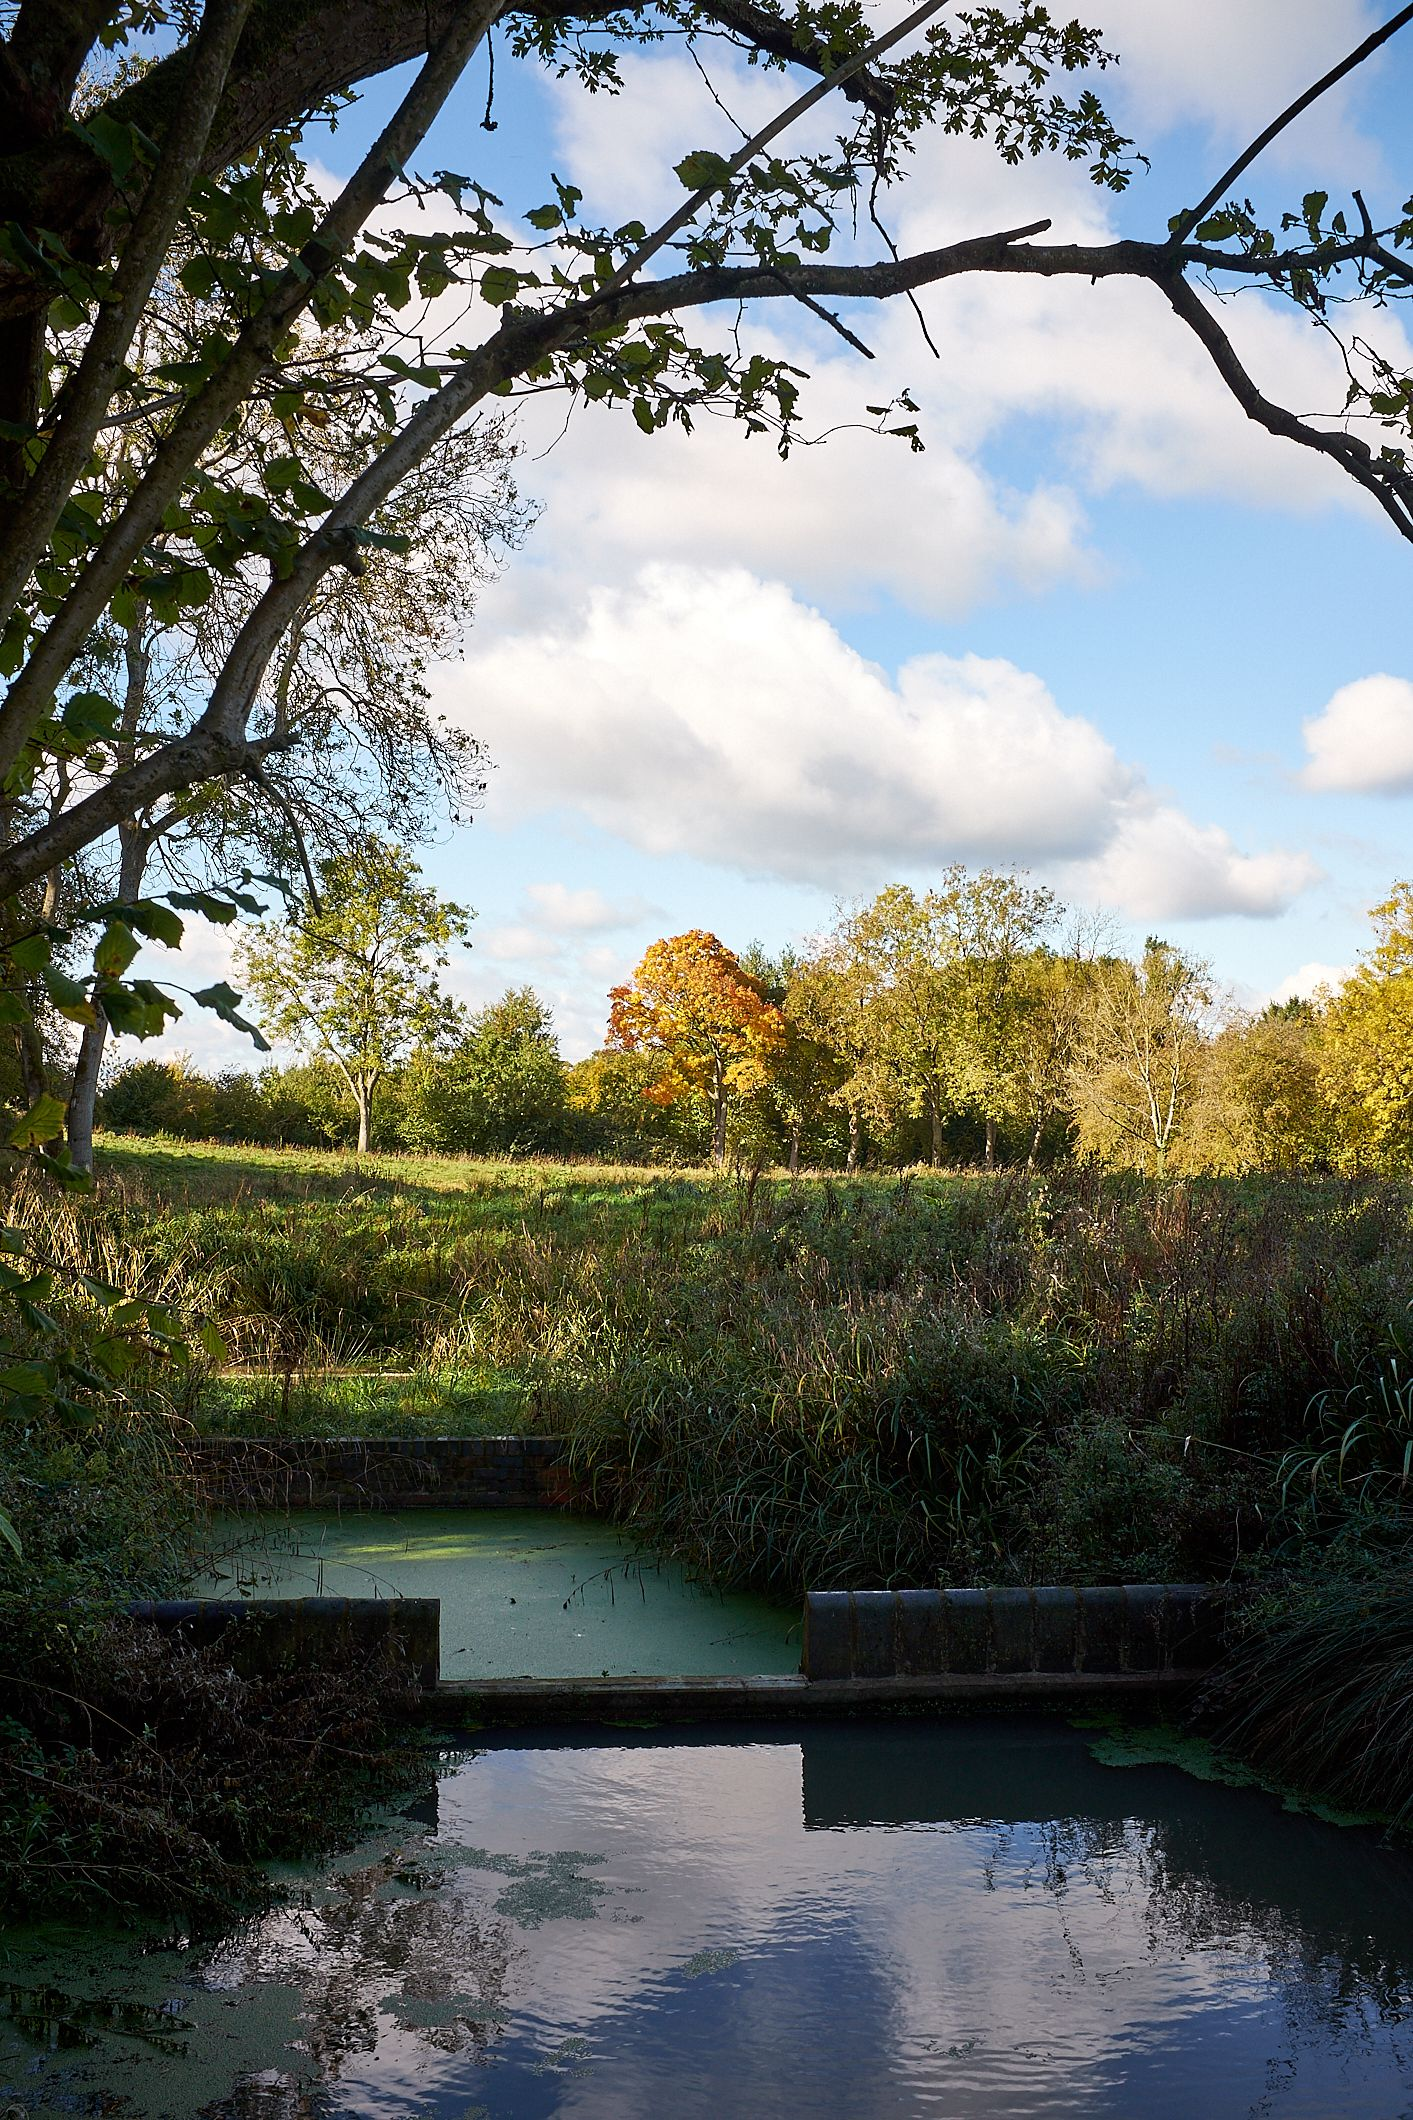 ponds and autumn tree